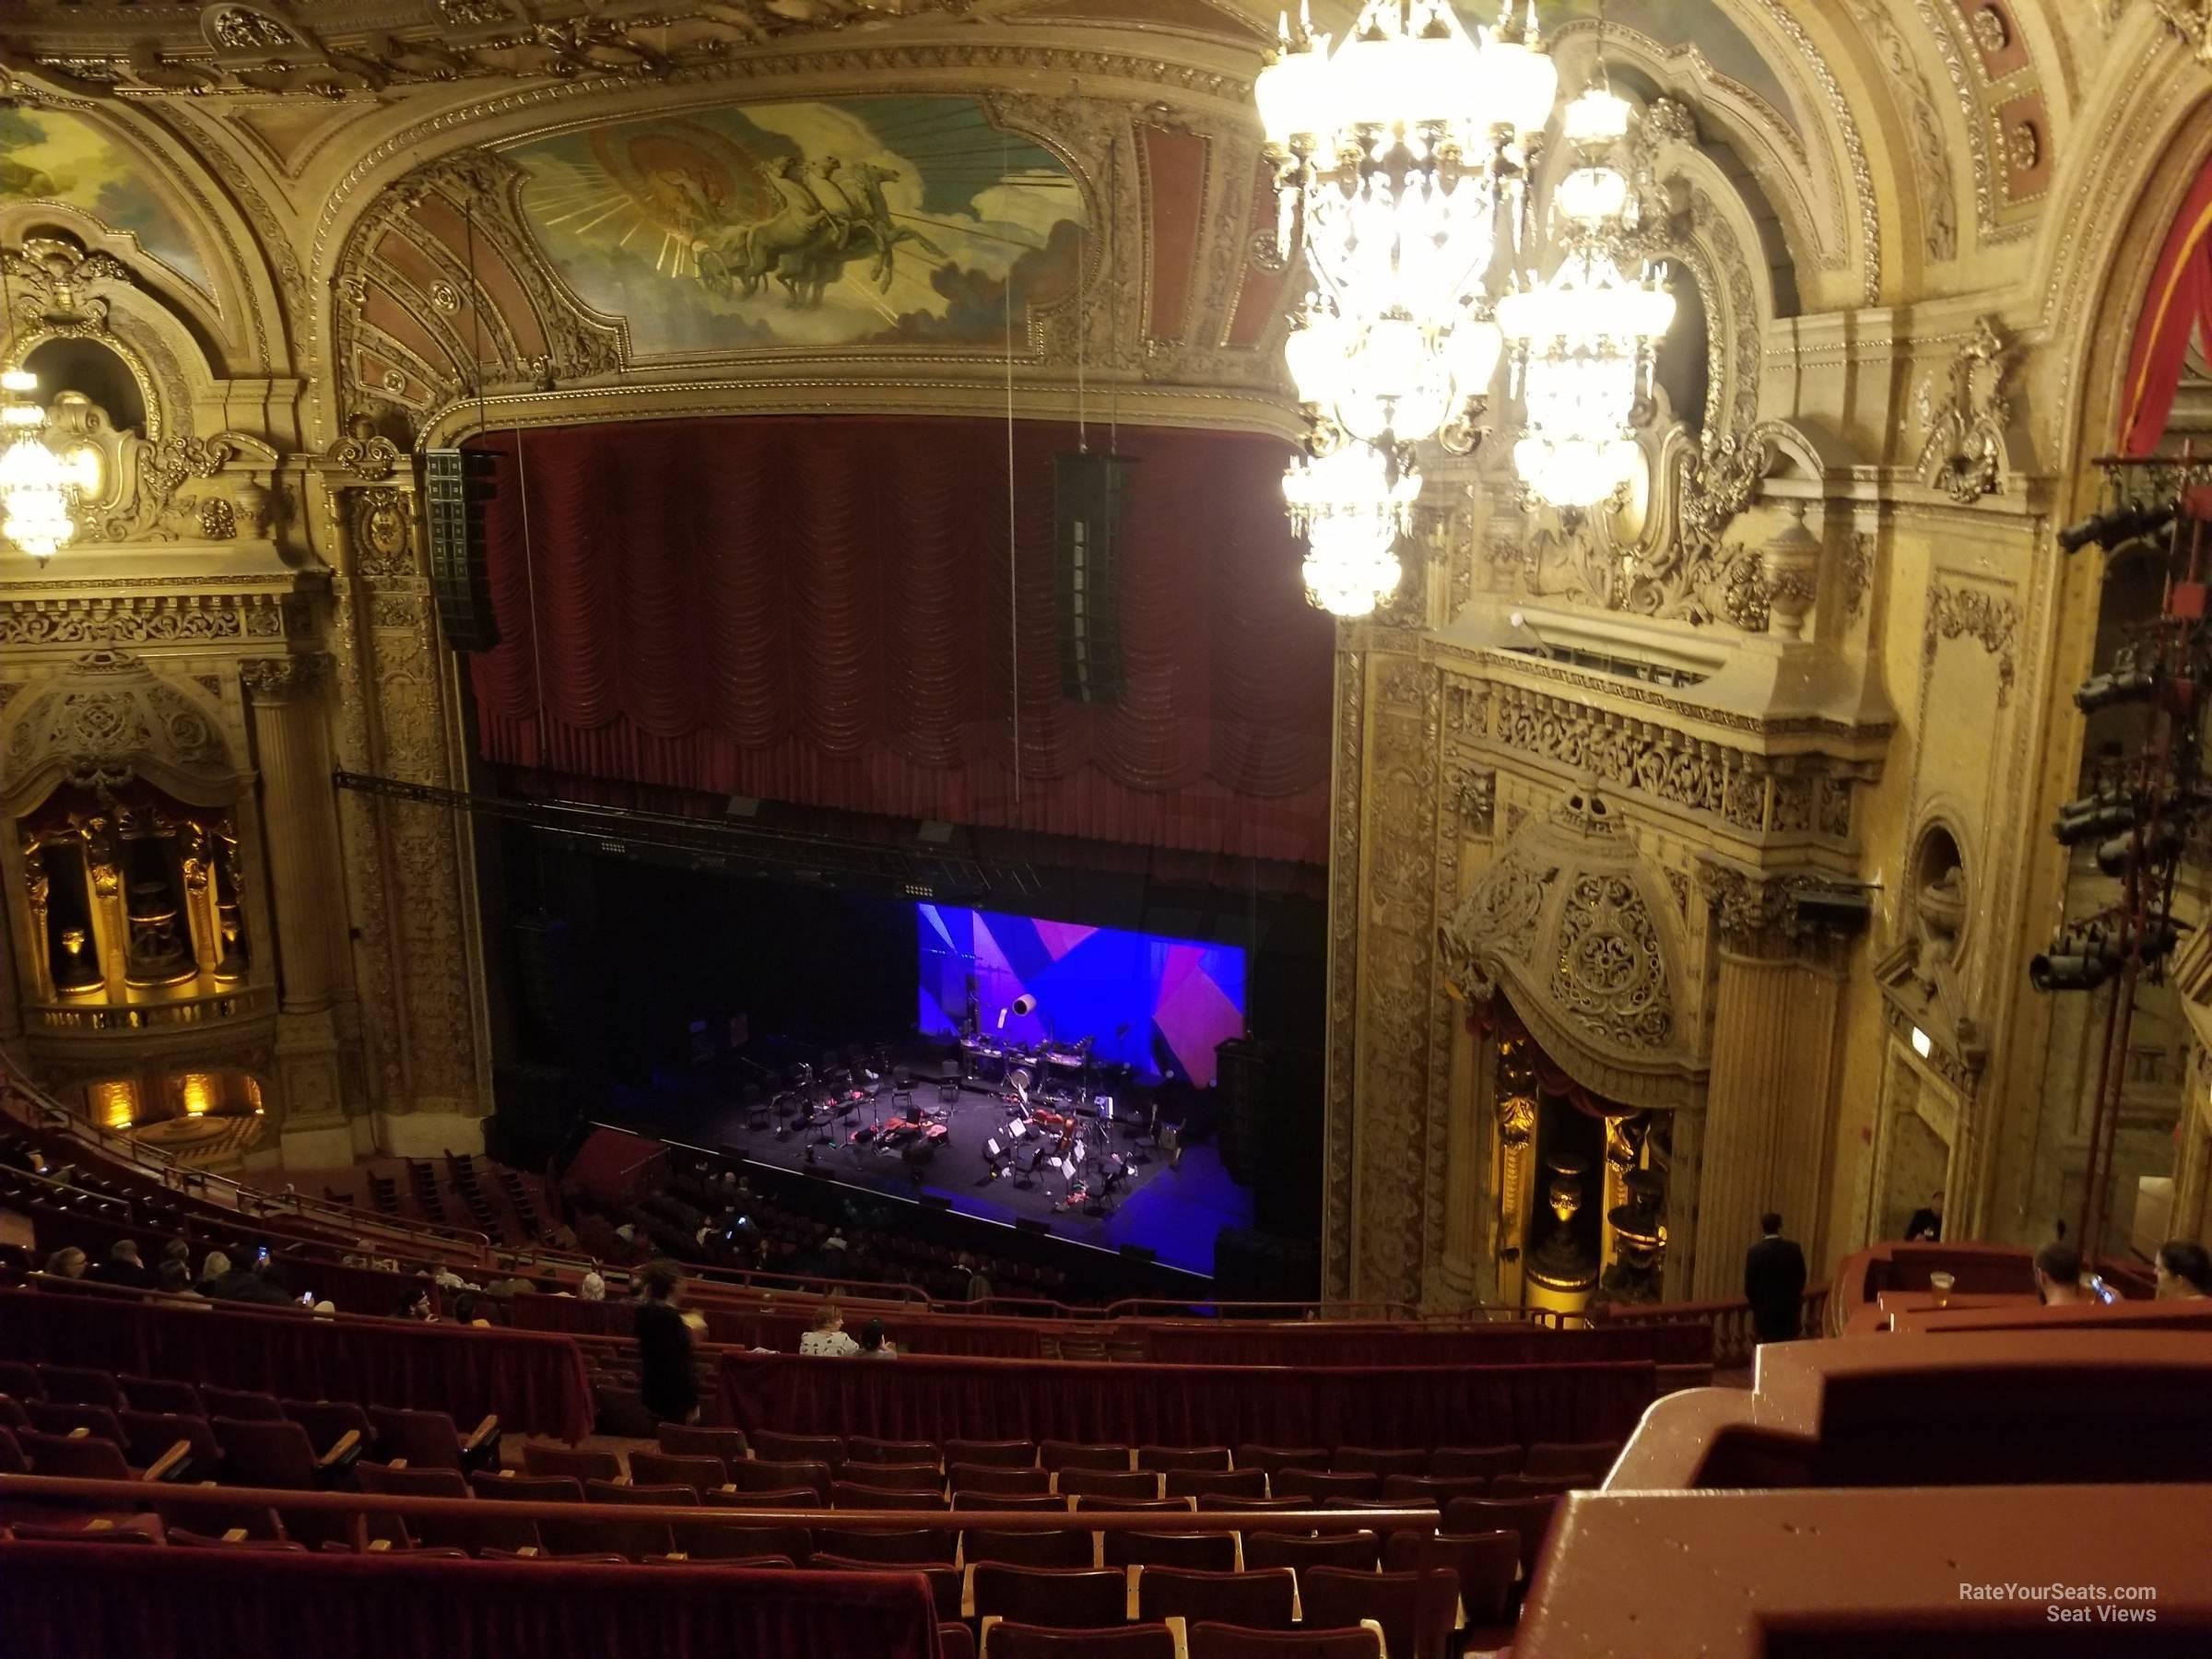 Balcony Box 17 at Chicago Theatre - RateYourSeats.com